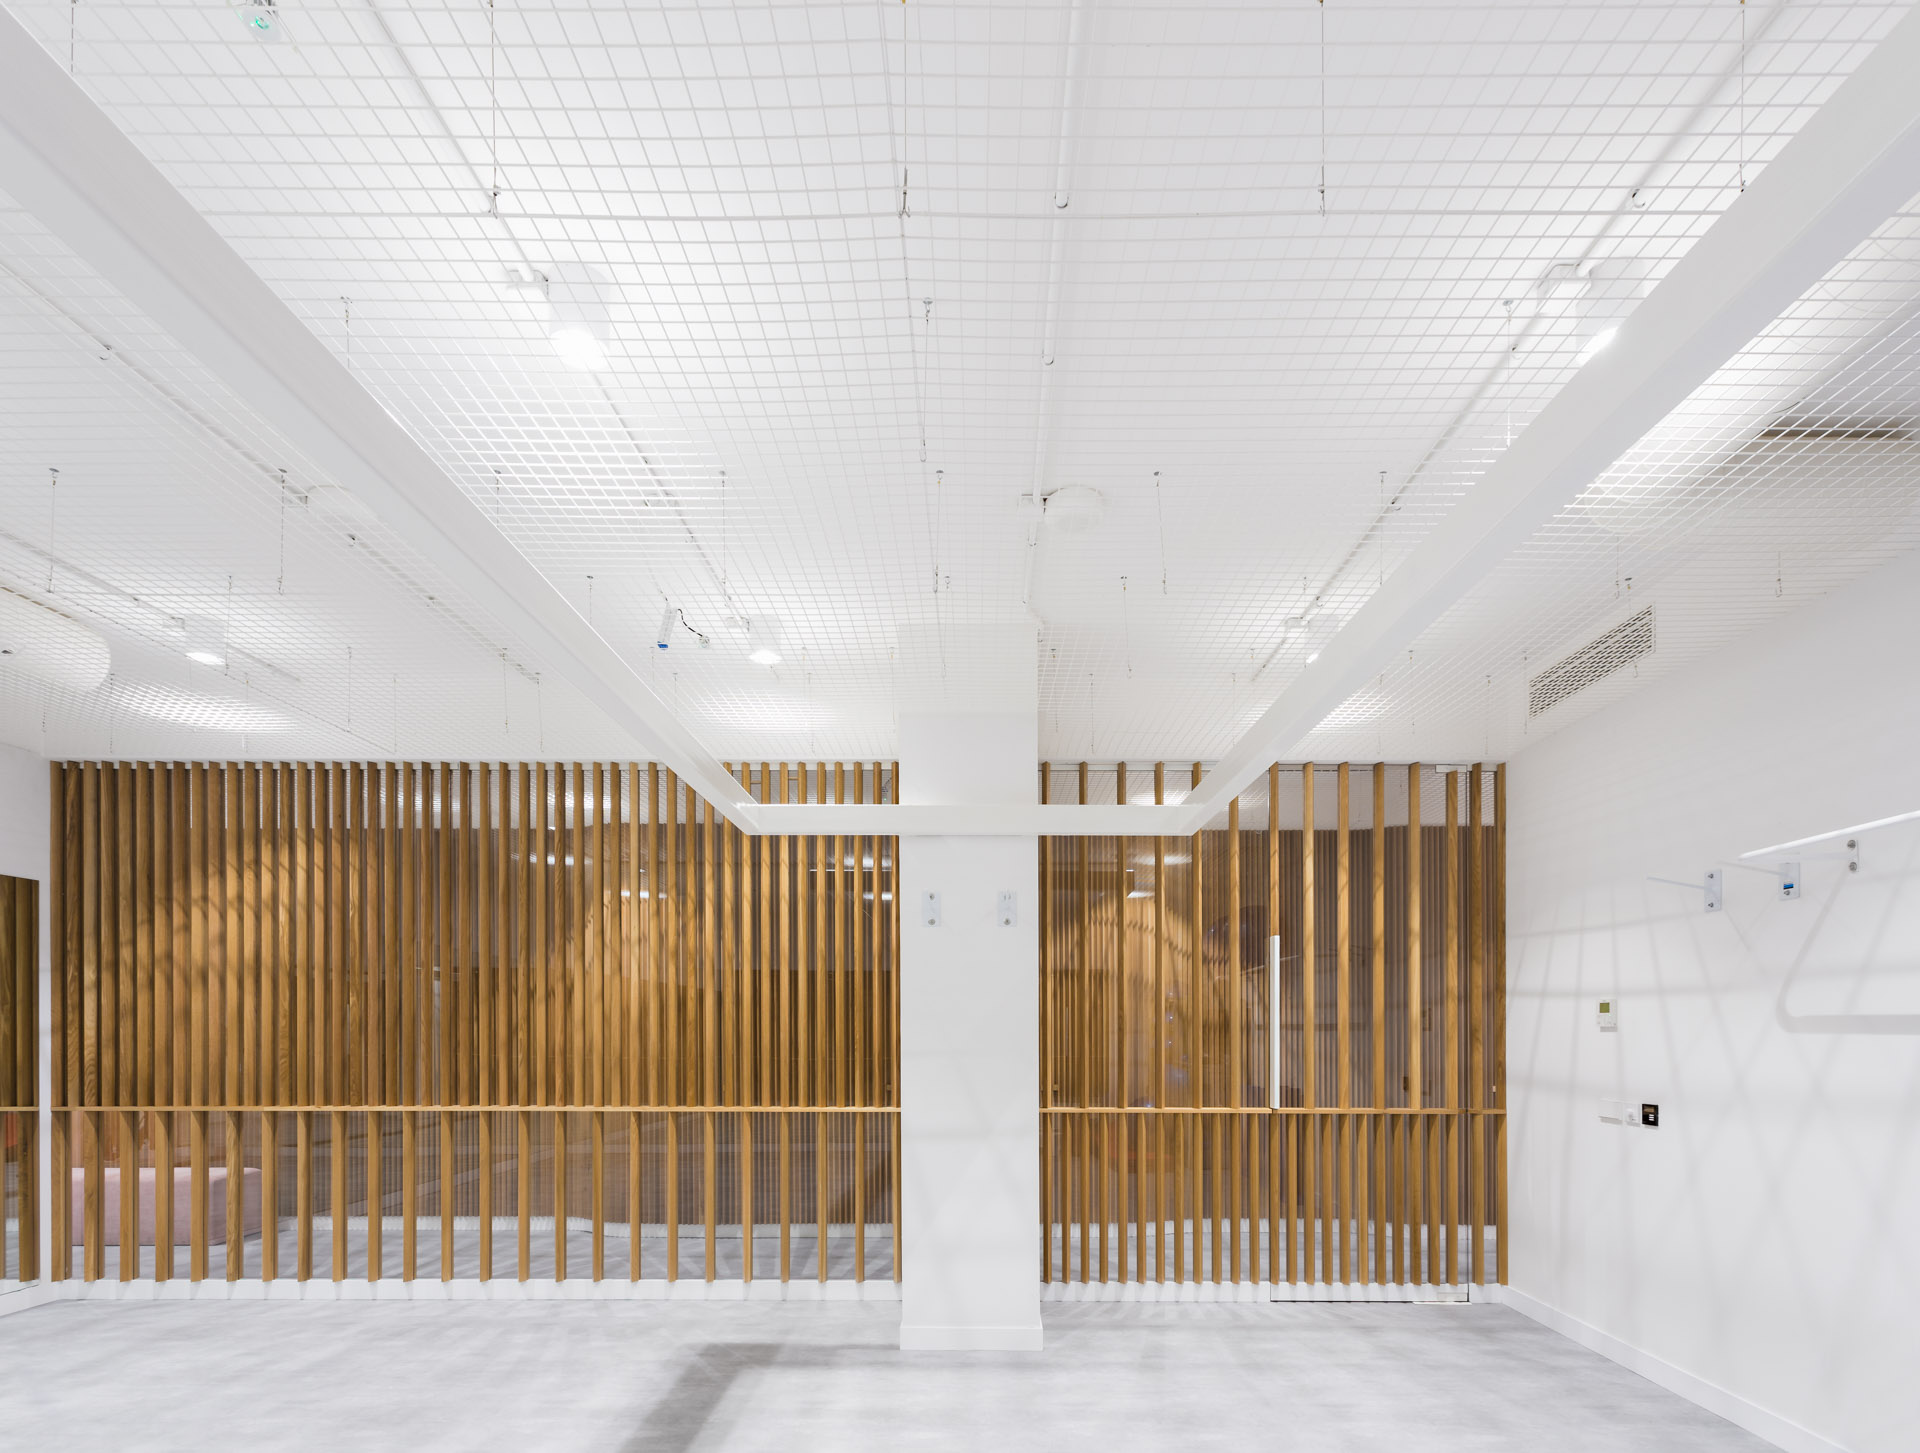 Alter Saúde   Otravueltadetuerca Arquitectura - Alter Saúde   Otravueltadetuerca Arquitectura   Jose Chas